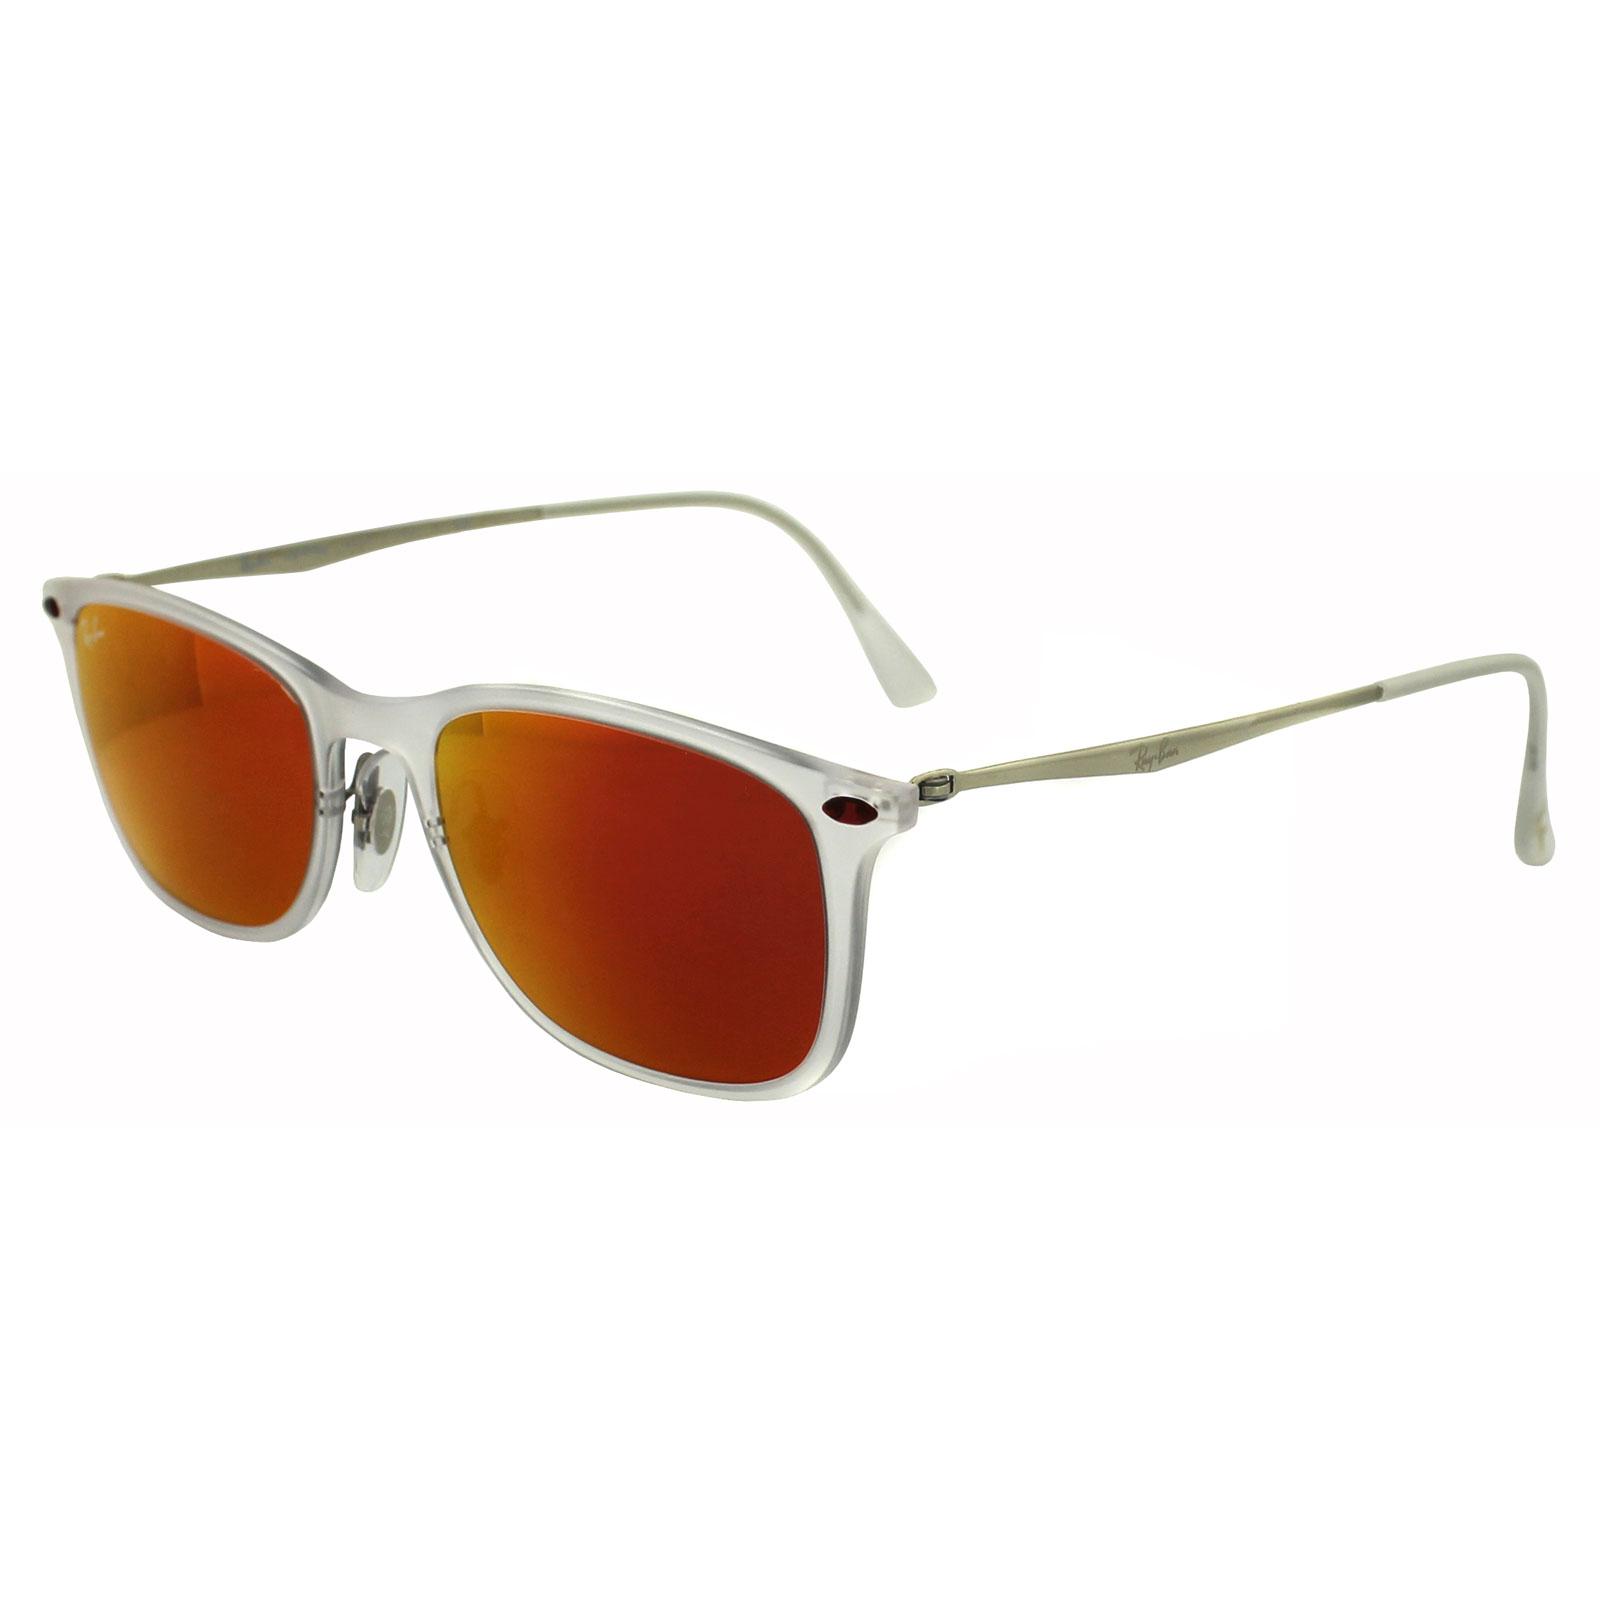 red ray ban sunglasses  Ray-Ban Sunglasses New Wayfarer Light Ray 4225 646/6Q Transparent ...